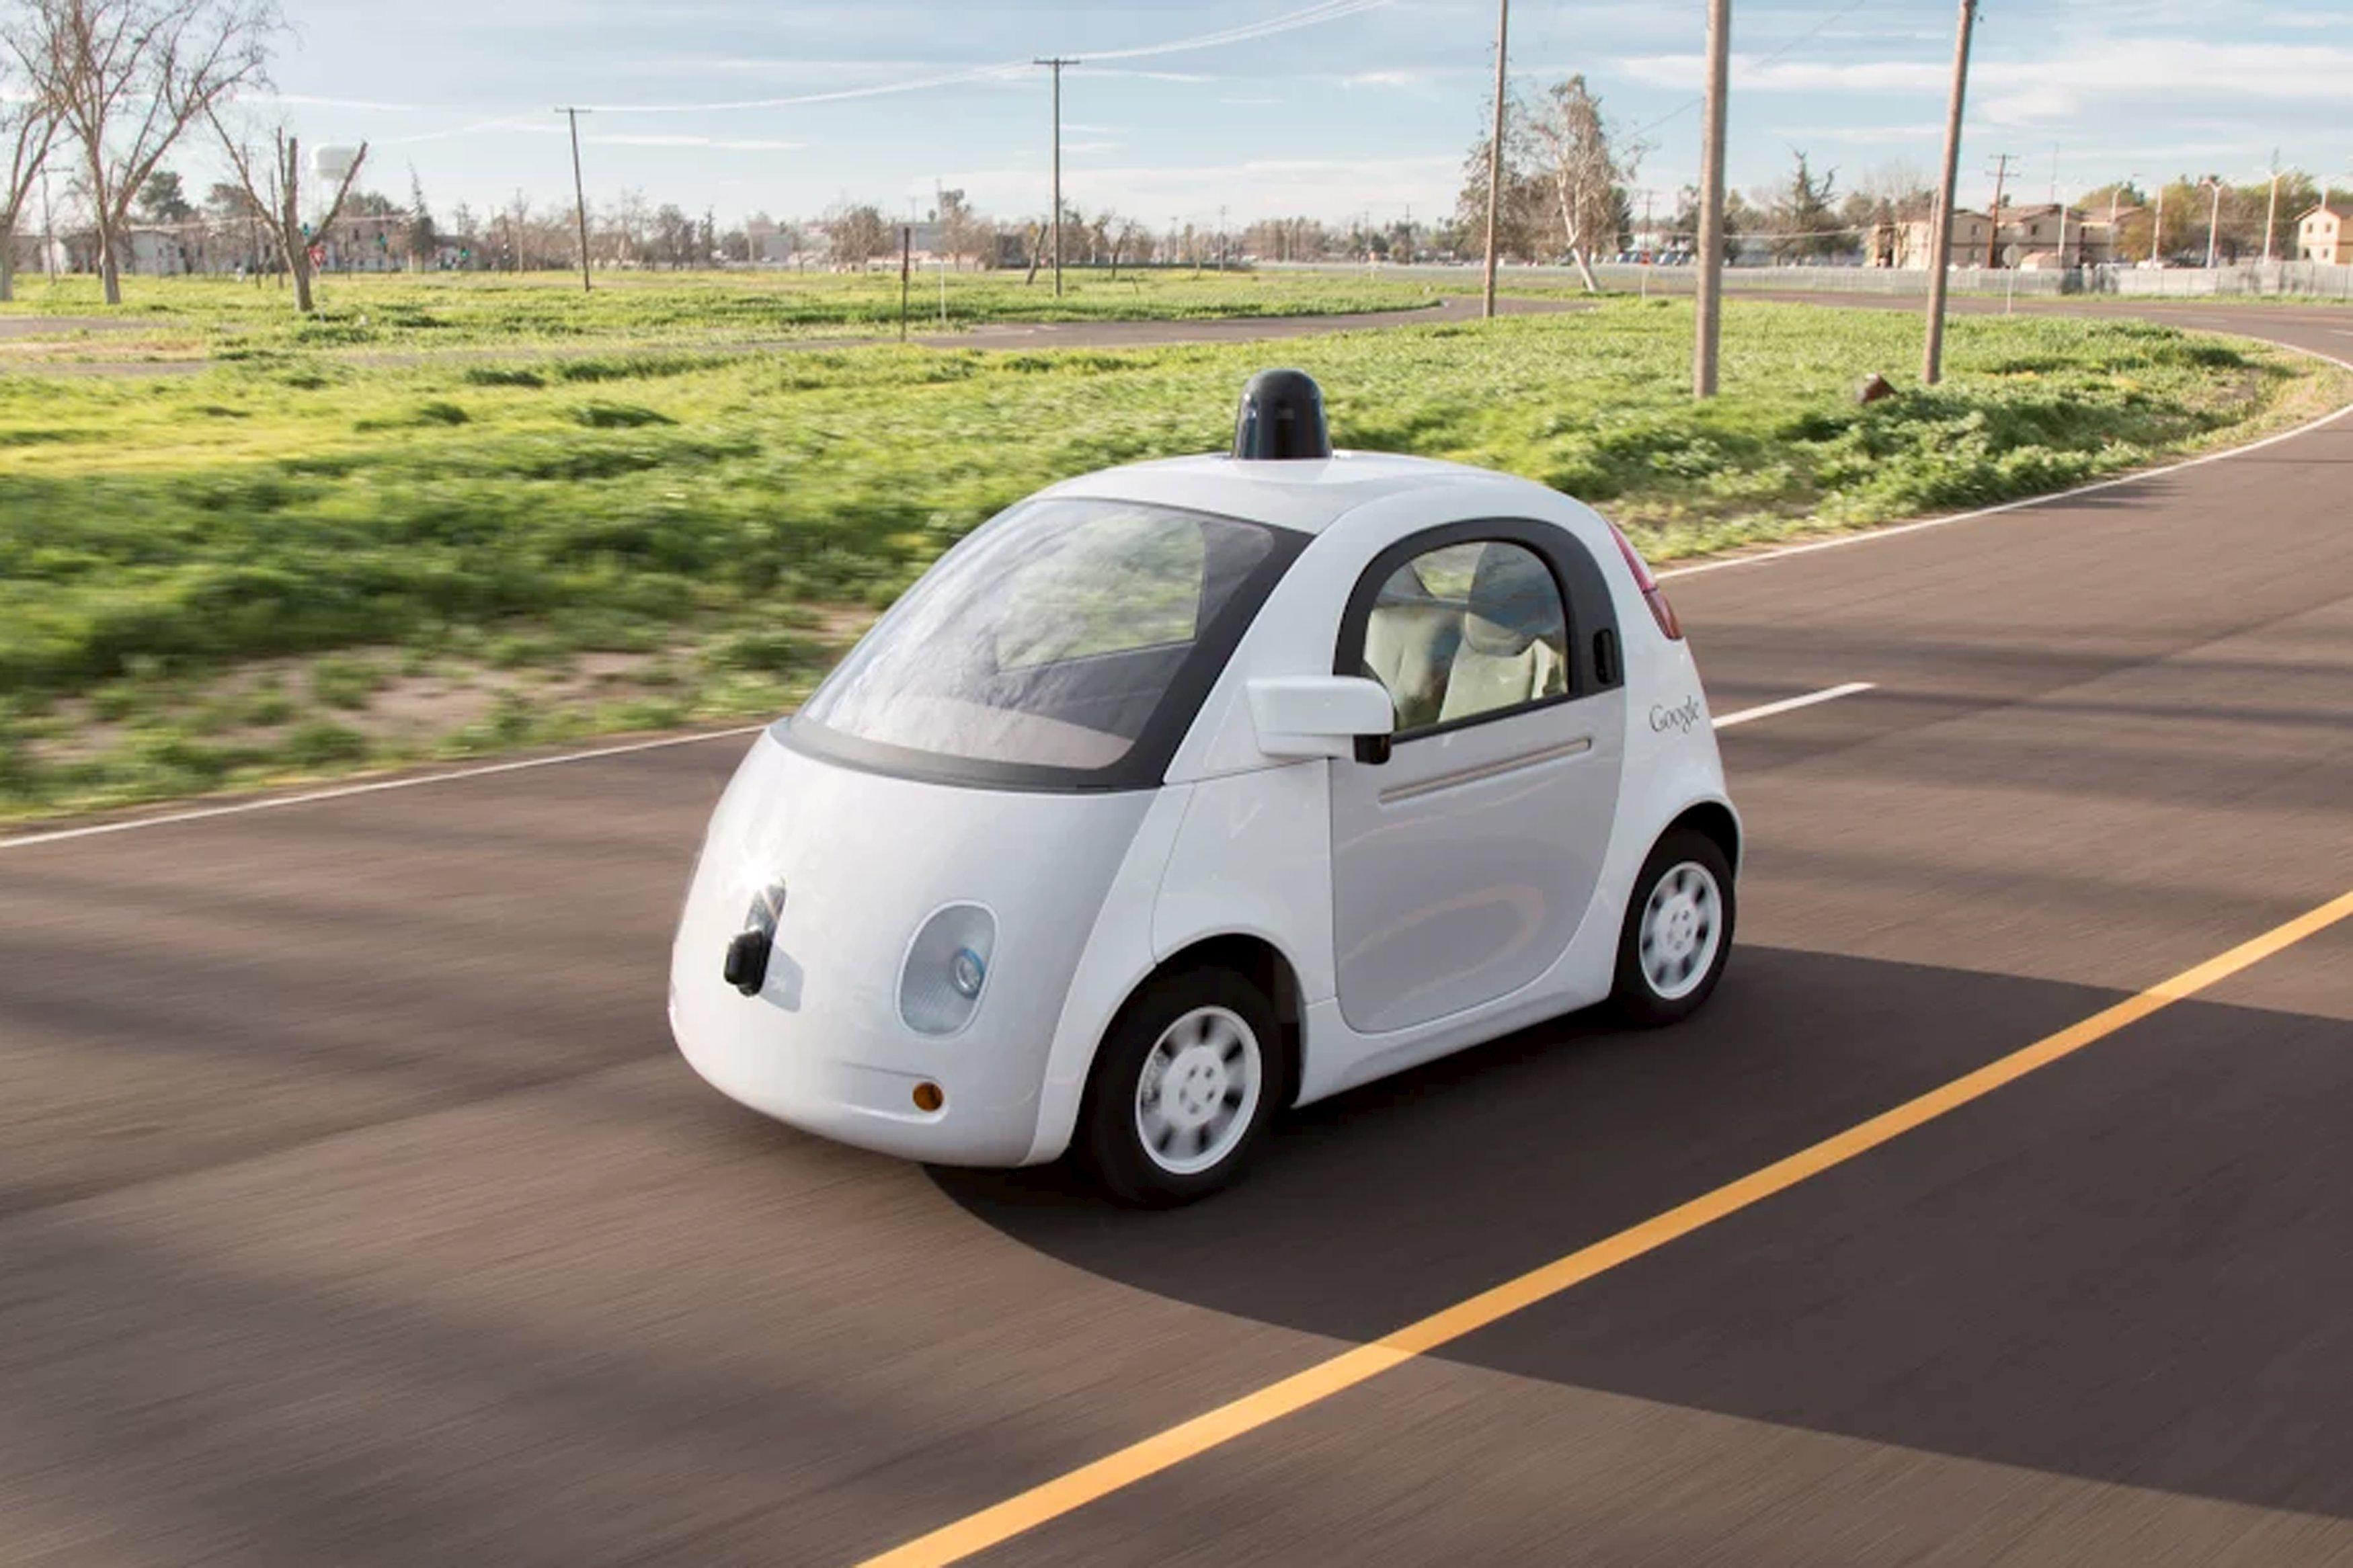 Google Tests Self-Driving Cars